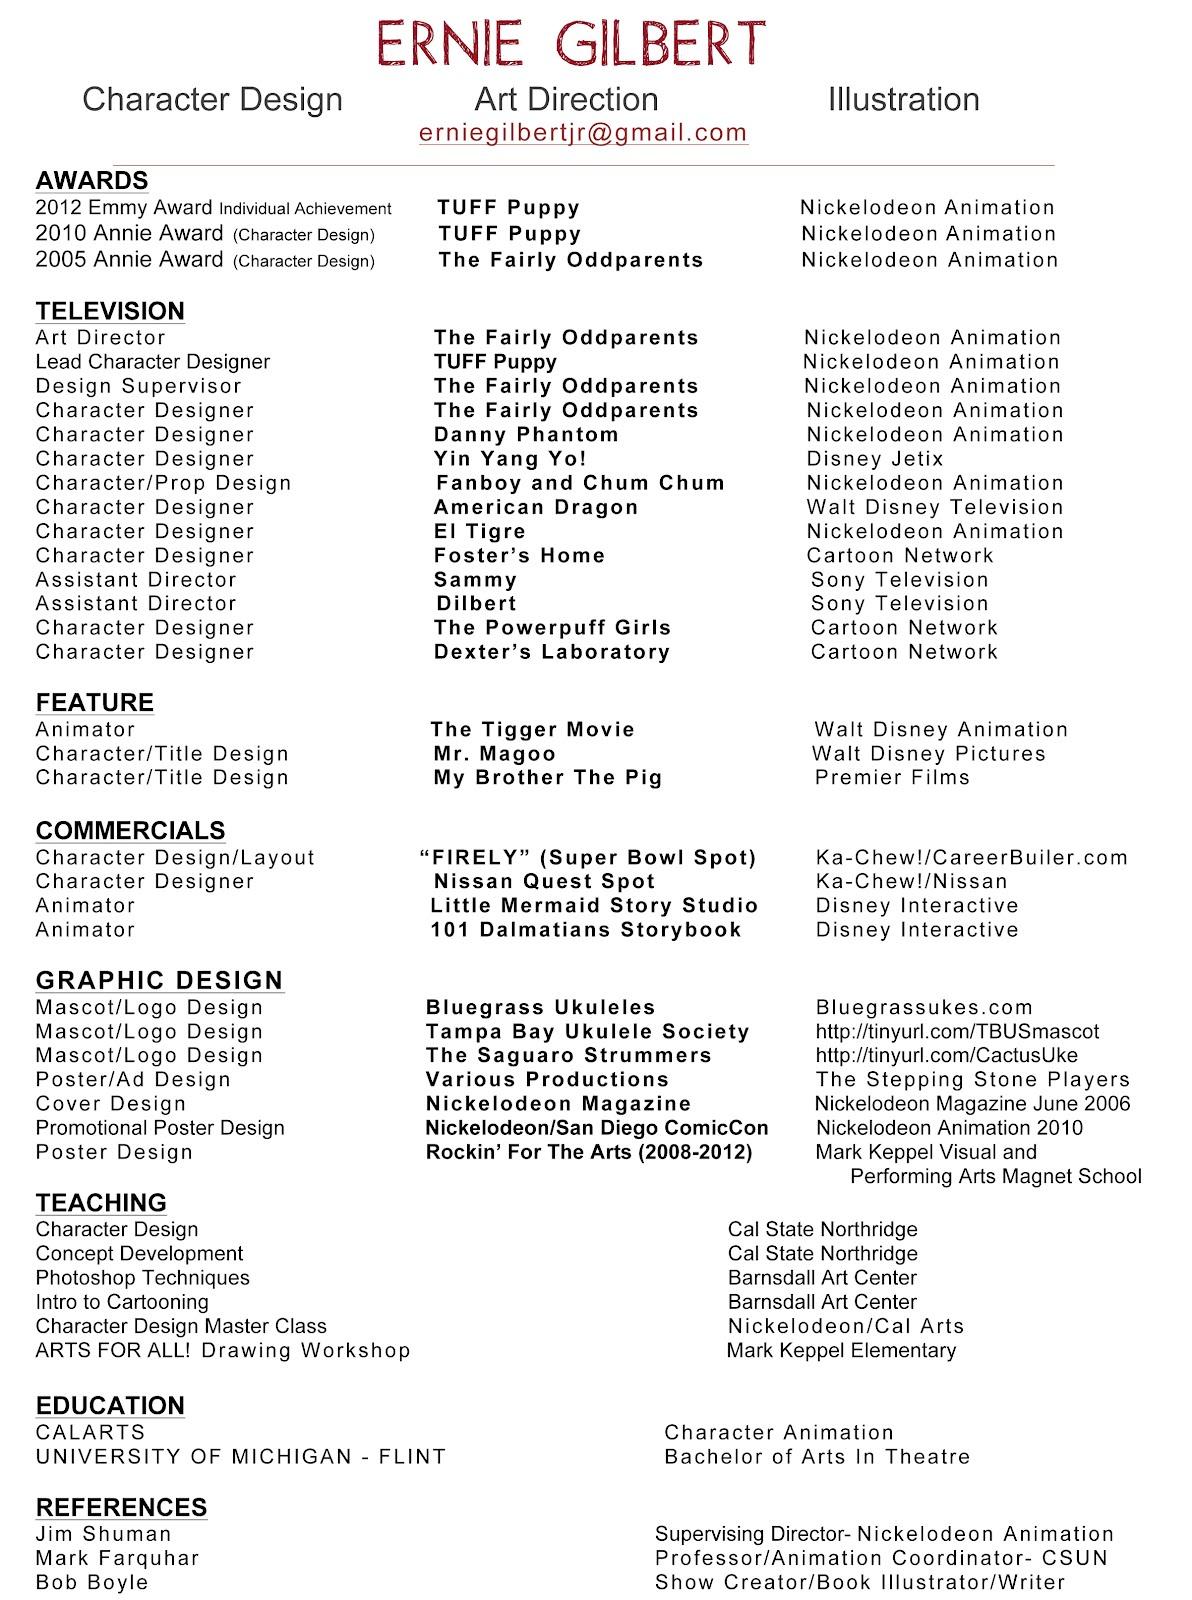 Ernie Gilbert My Resume Animation